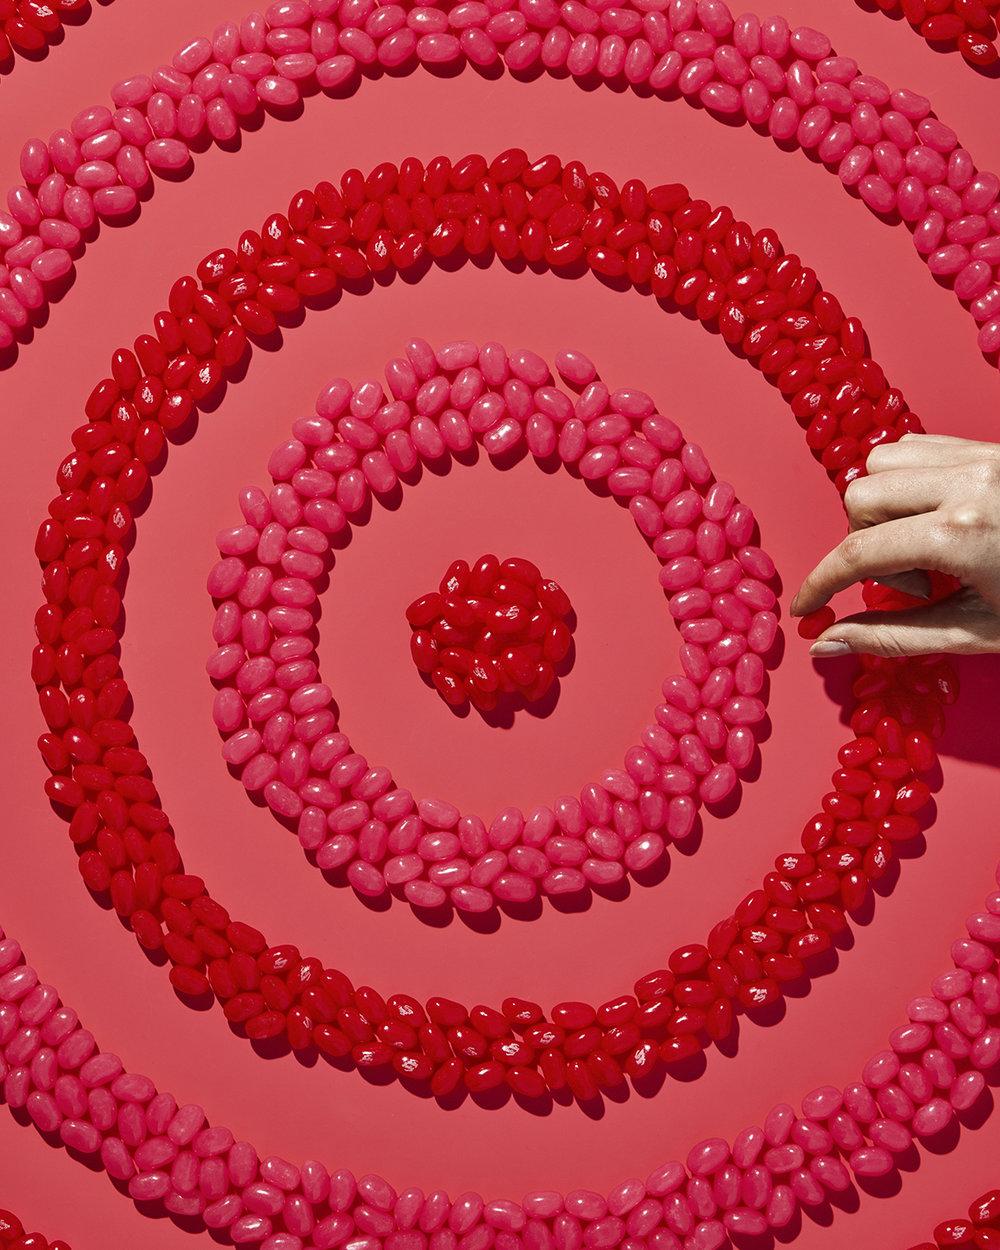 Jelly Beans.jpg